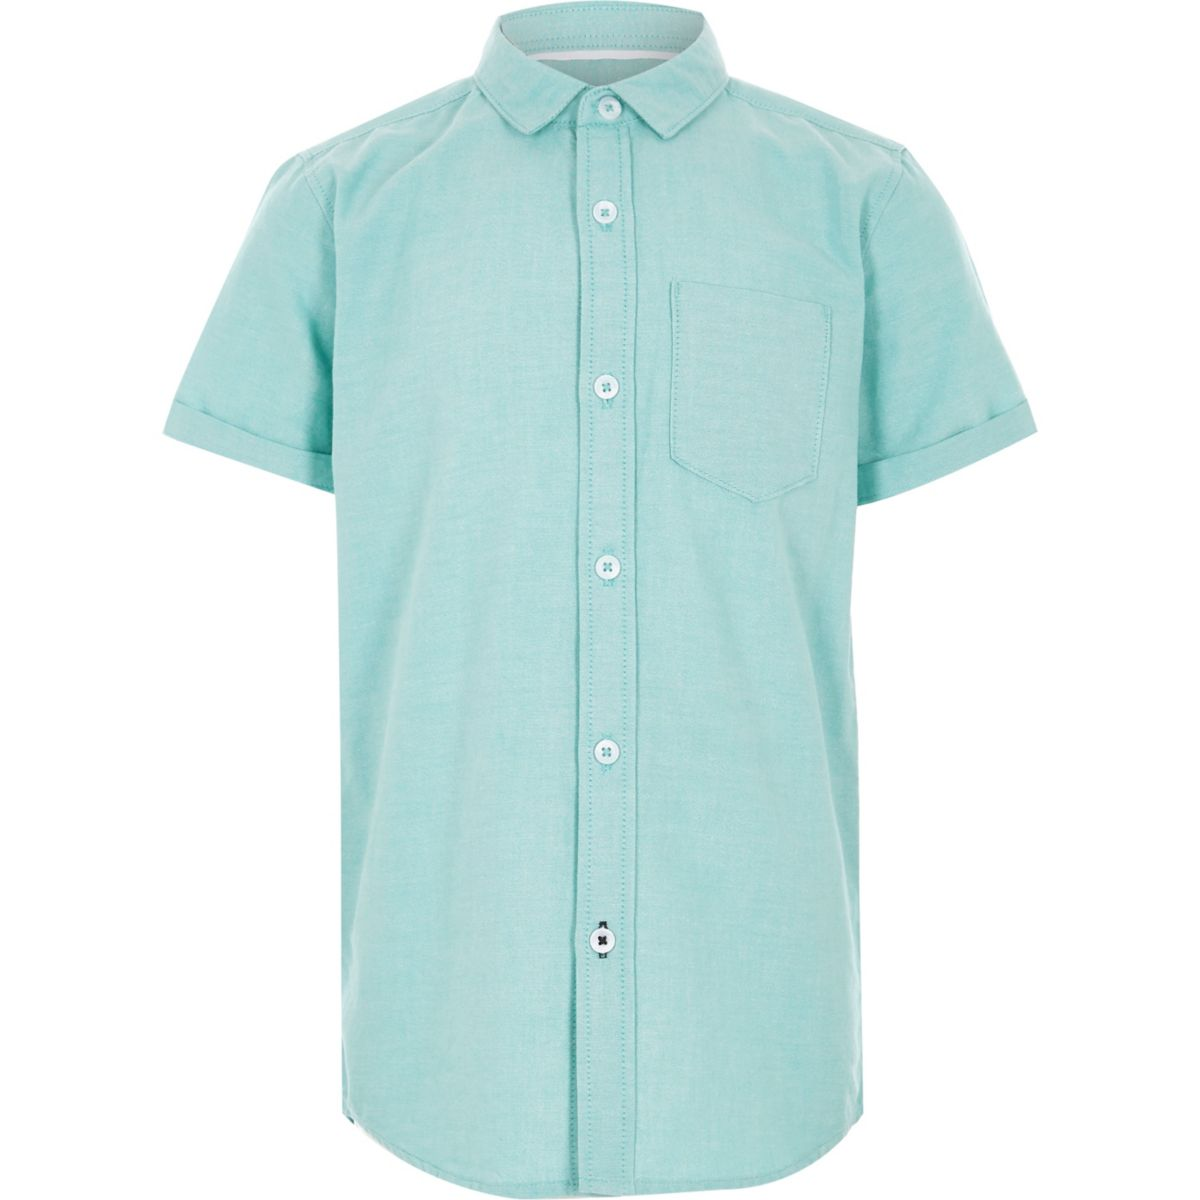 Boys mint green short sleeve Oxford shirt